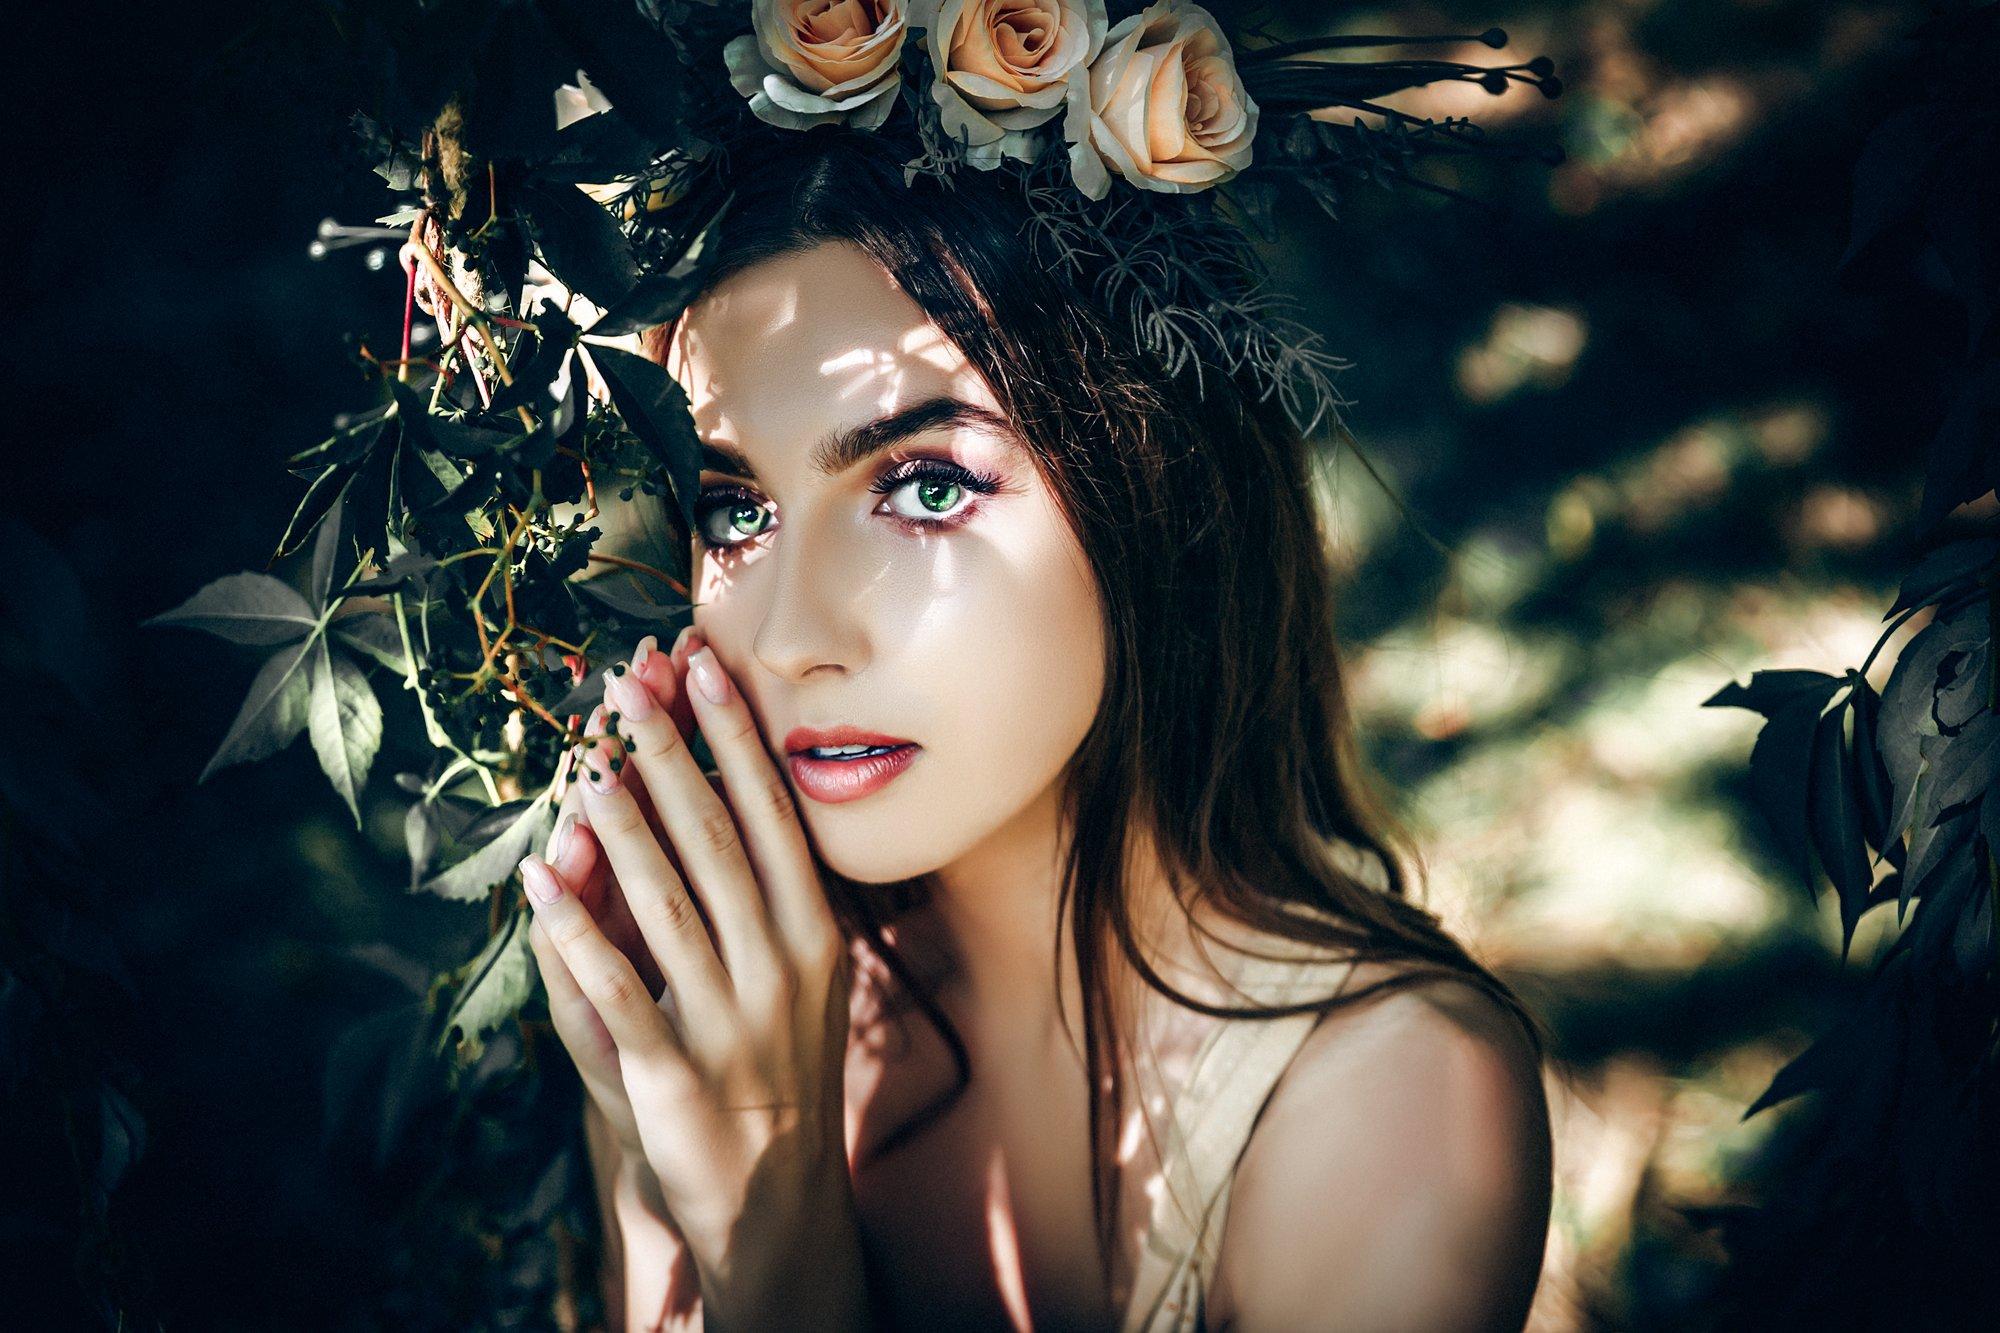 woman, beauty, portrait, art, outdoors, light, Руслан Болгов (Axe)